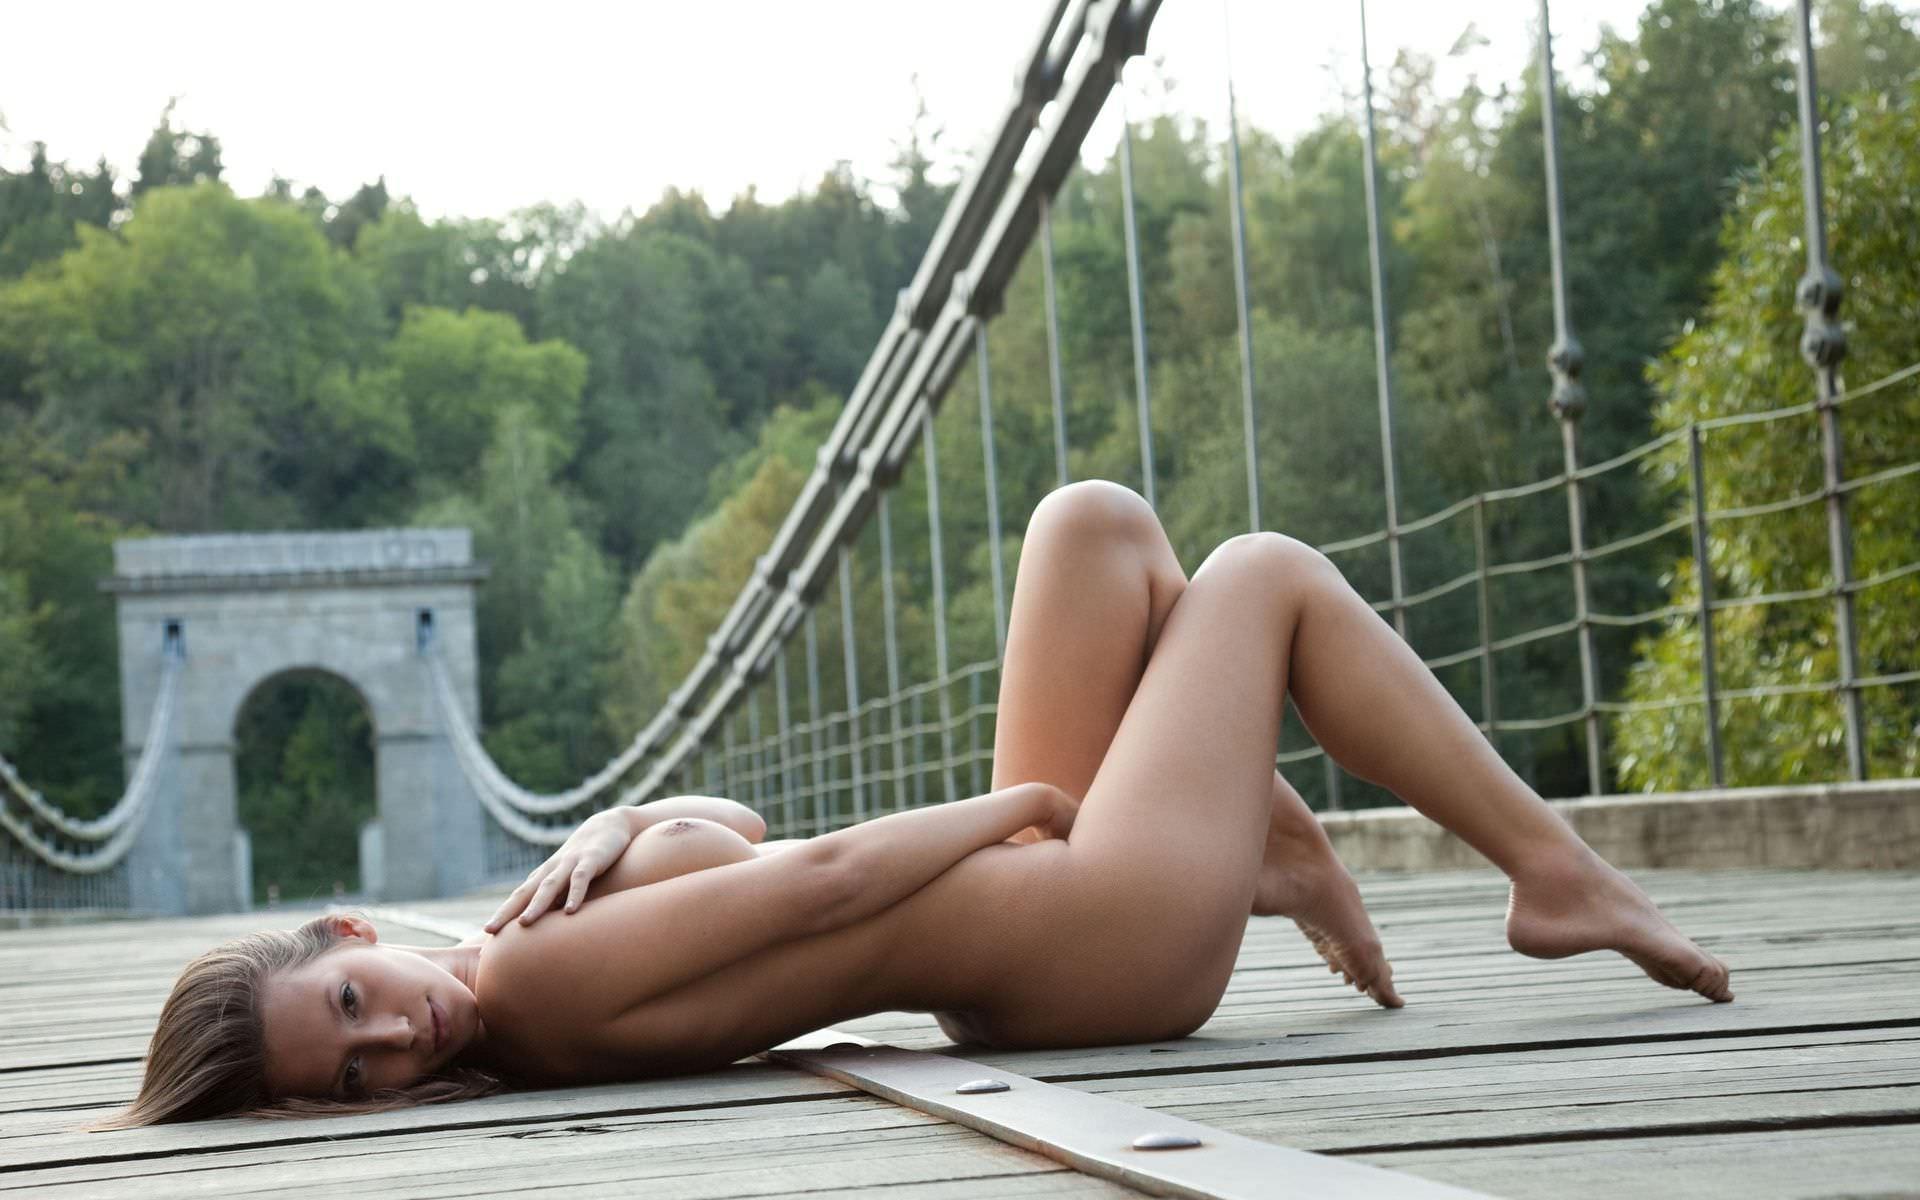 Unknown naked girl walk in rawalpindi new photo